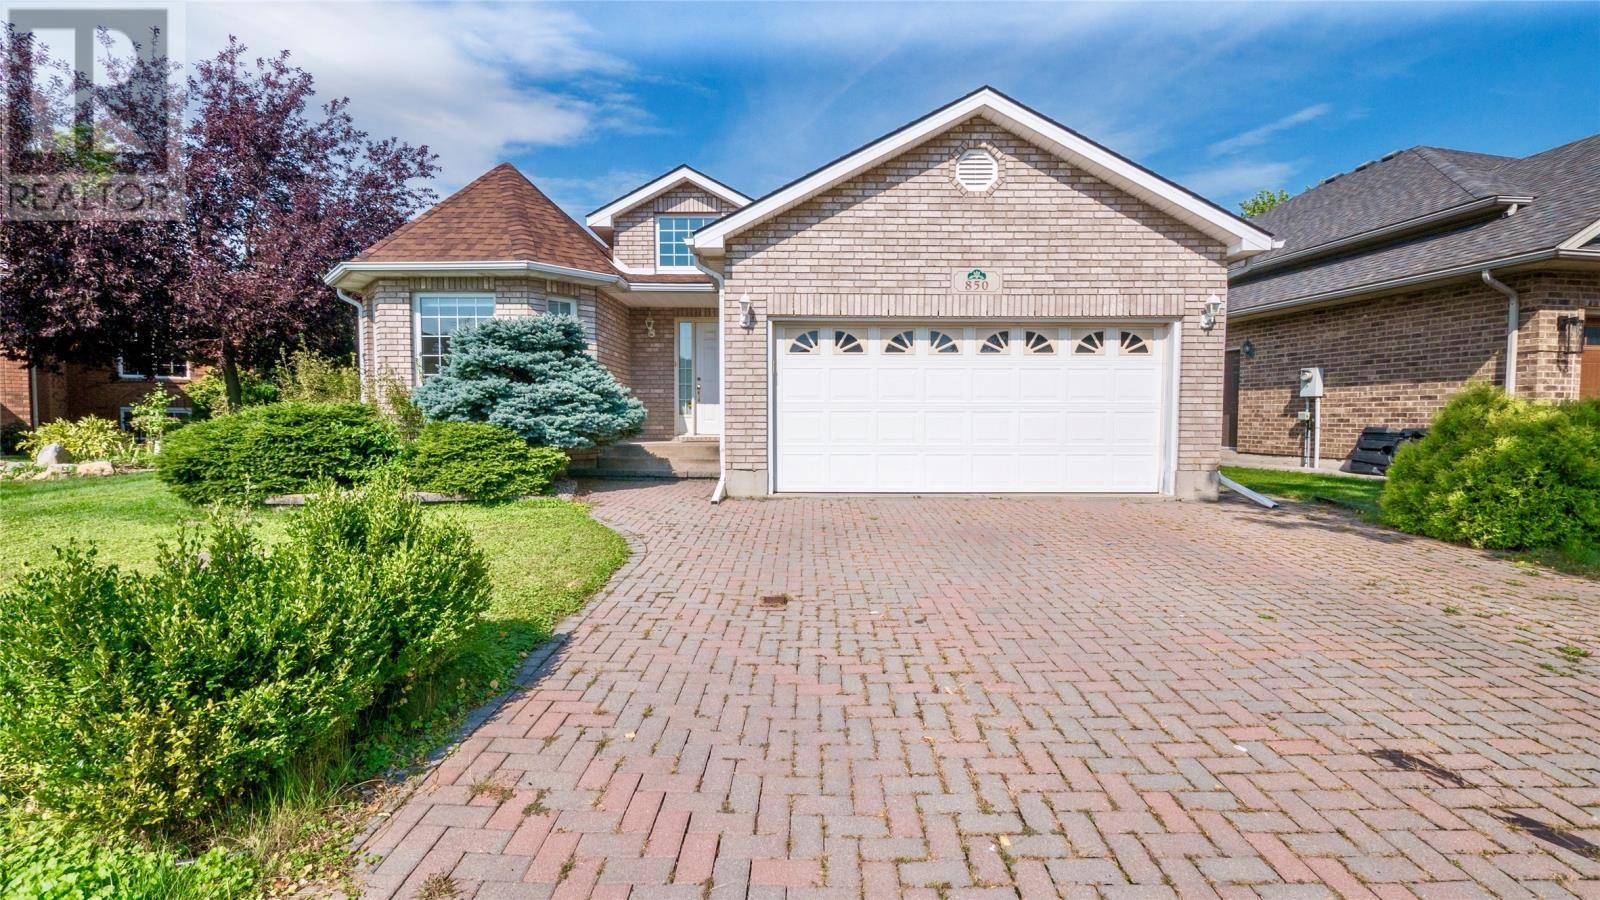 House for sale at 850 Hacienda  Windsor Ontario - MLS: 19025406